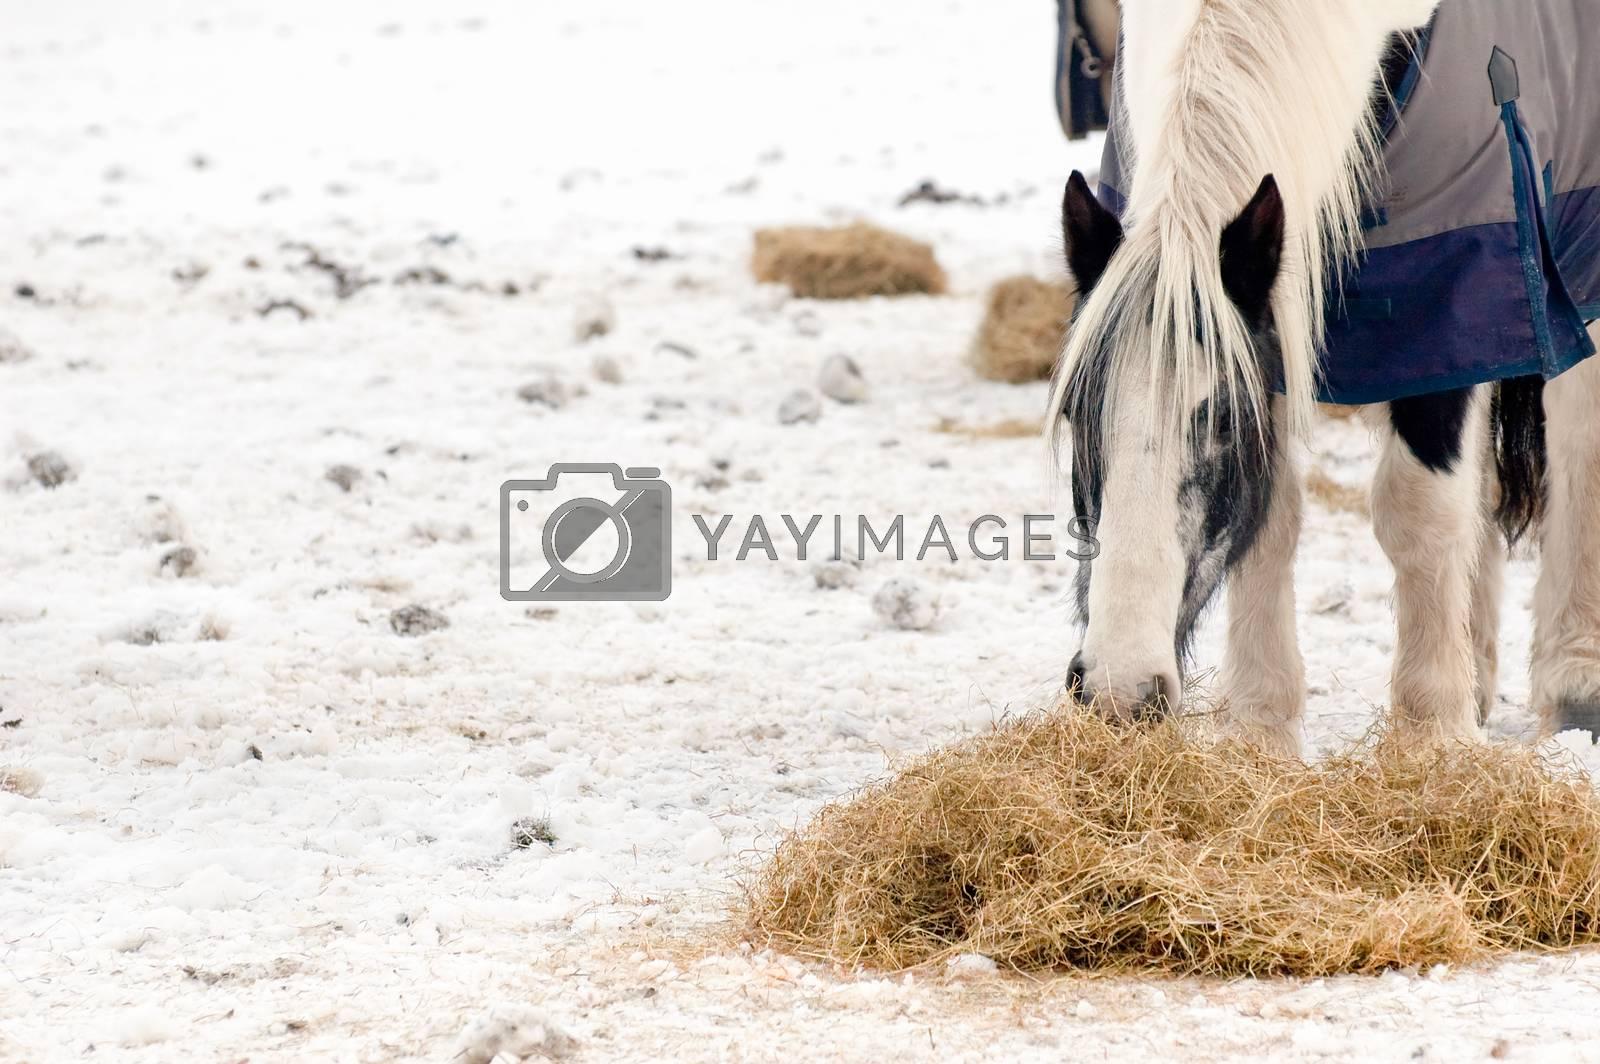 Royalty free image of horse feeding by nelsonart